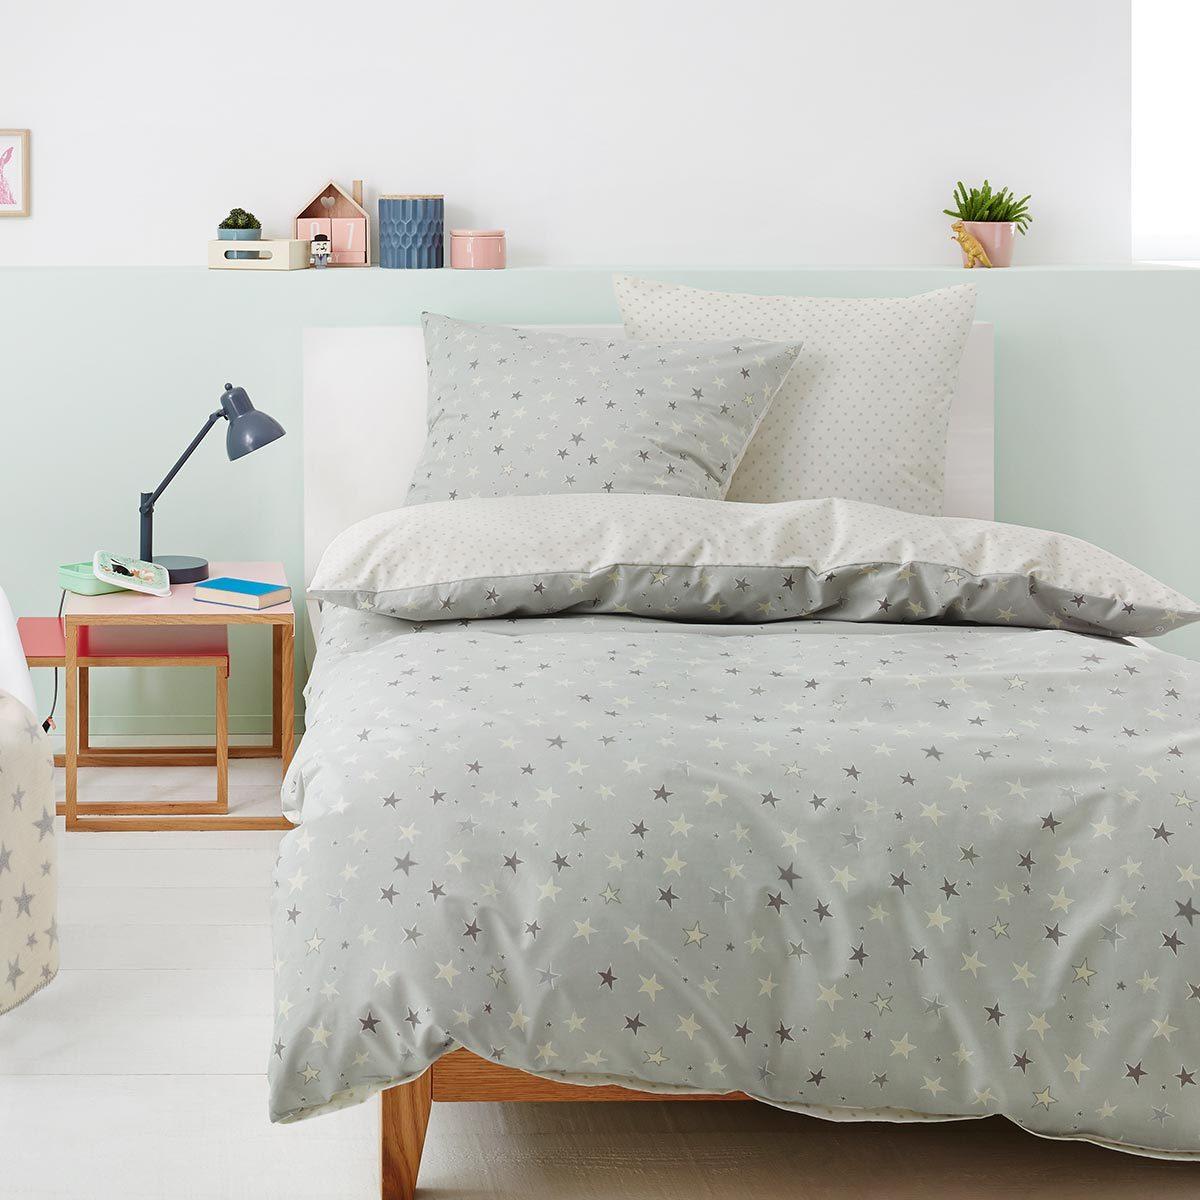 s oliver renforce bettw sche sterne silber wei g nstig. Black Bedroom Furniture Sets. Home Design Ideas